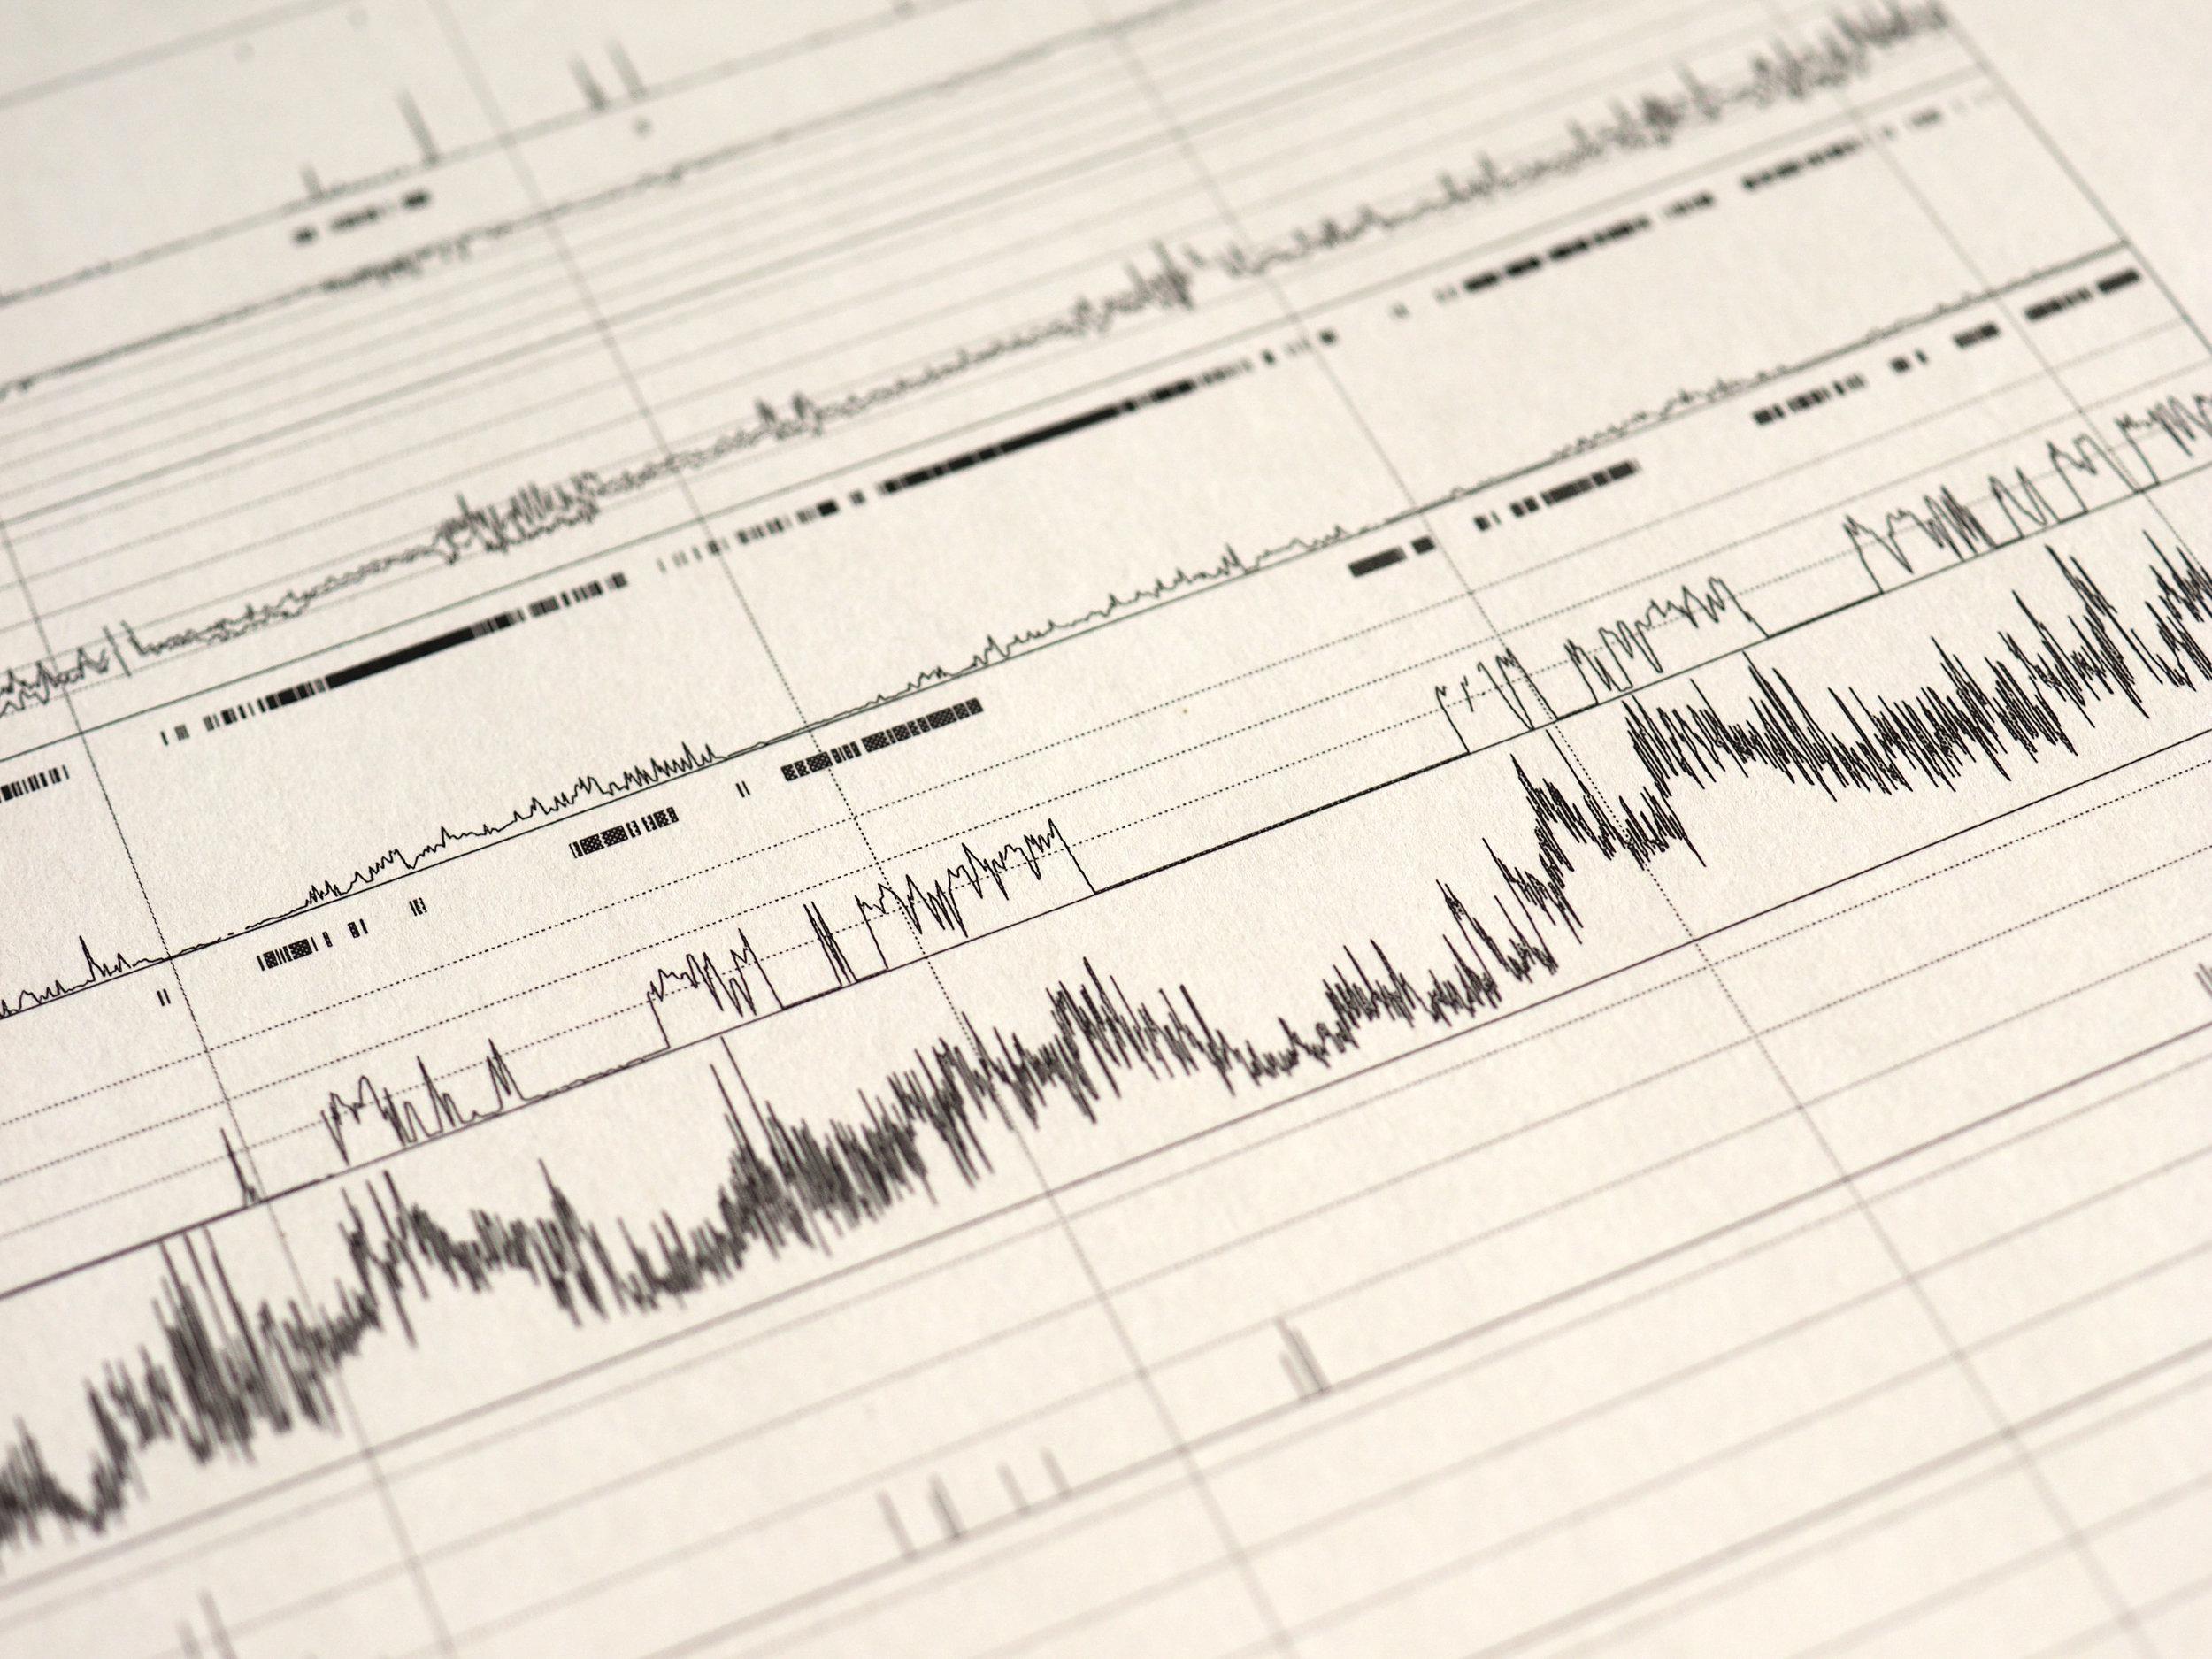 polysomnography monitoring to diagnose sleep disorders like sleep apnea